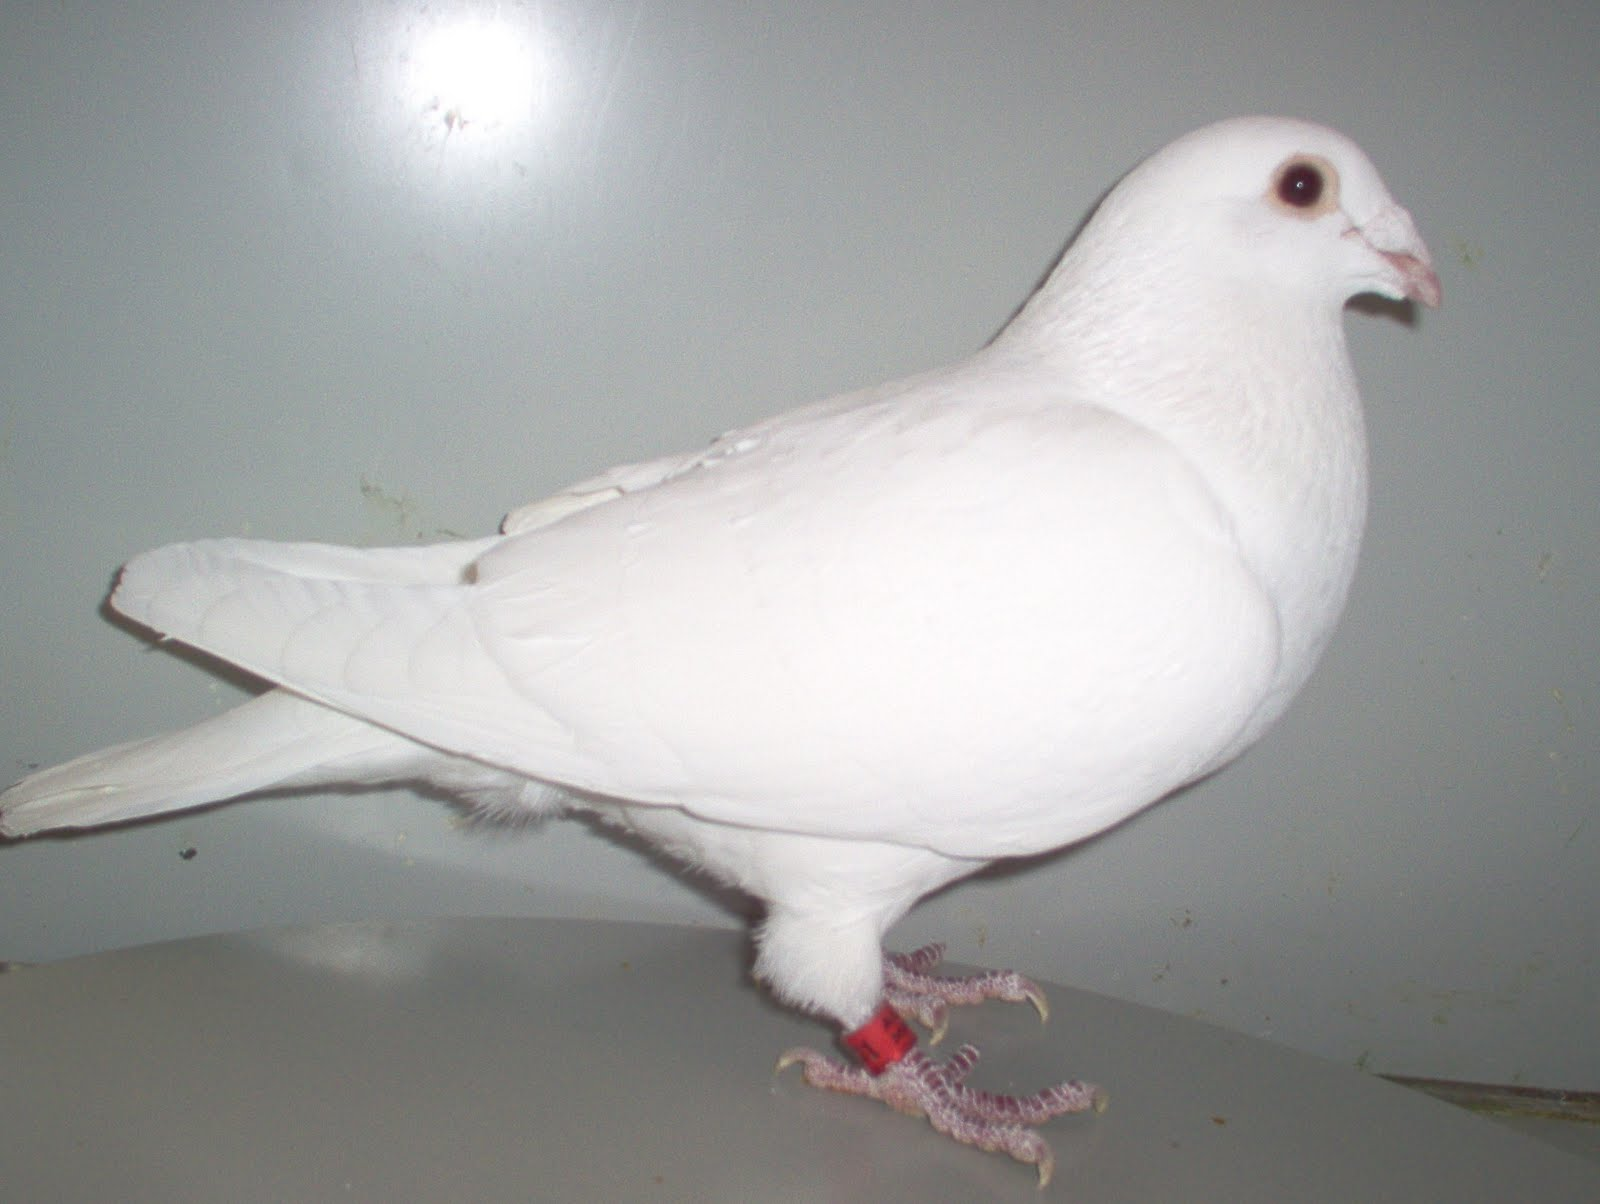 Pigeon forge craigslist personals